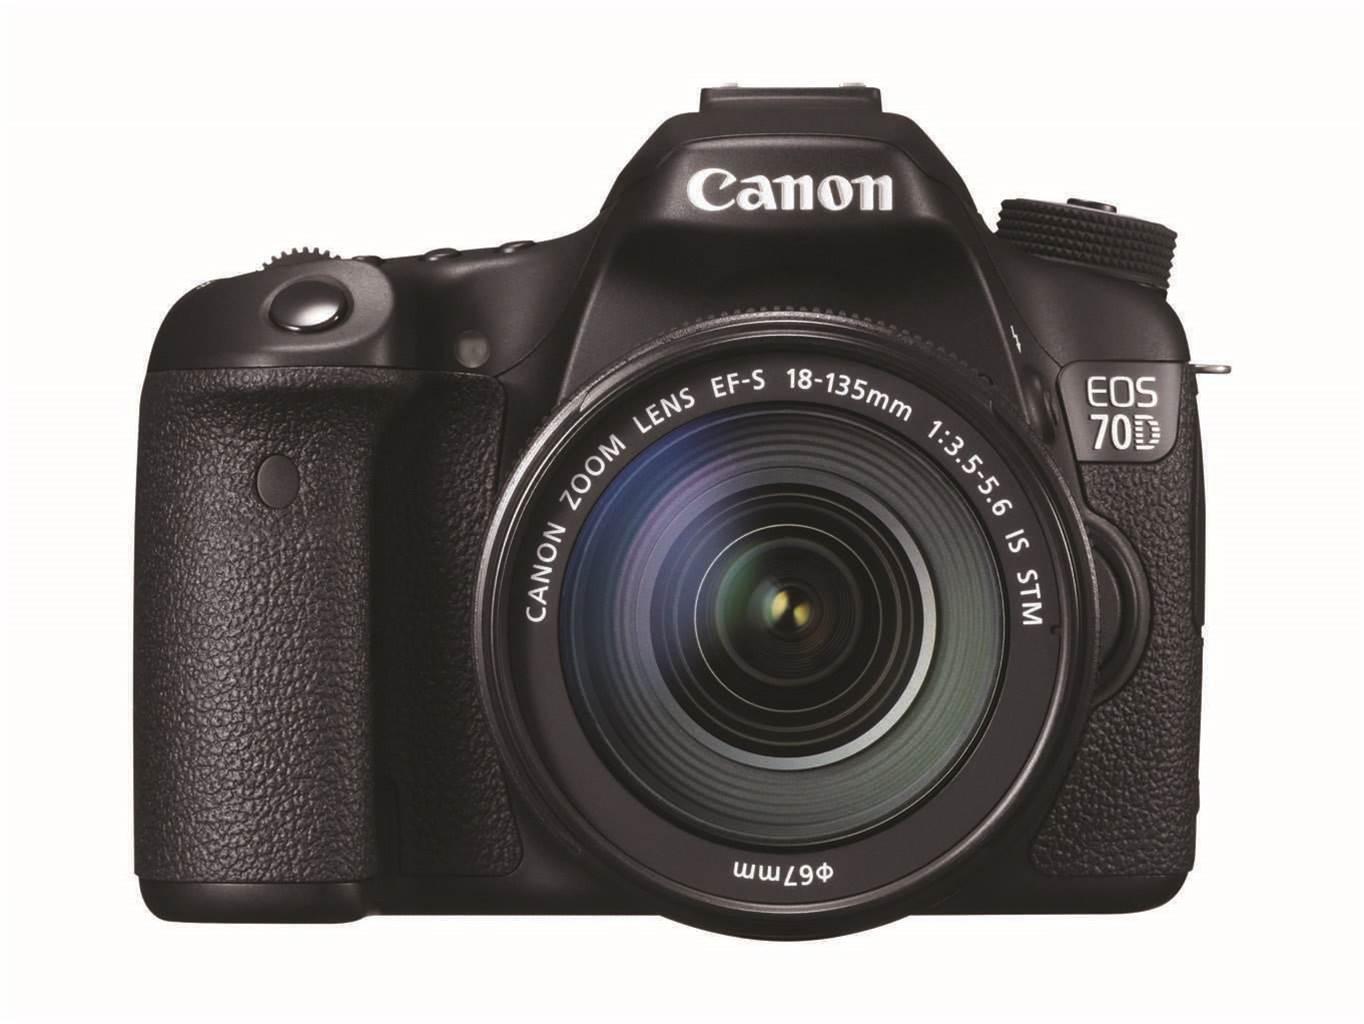 Review: Canon EOS 70D